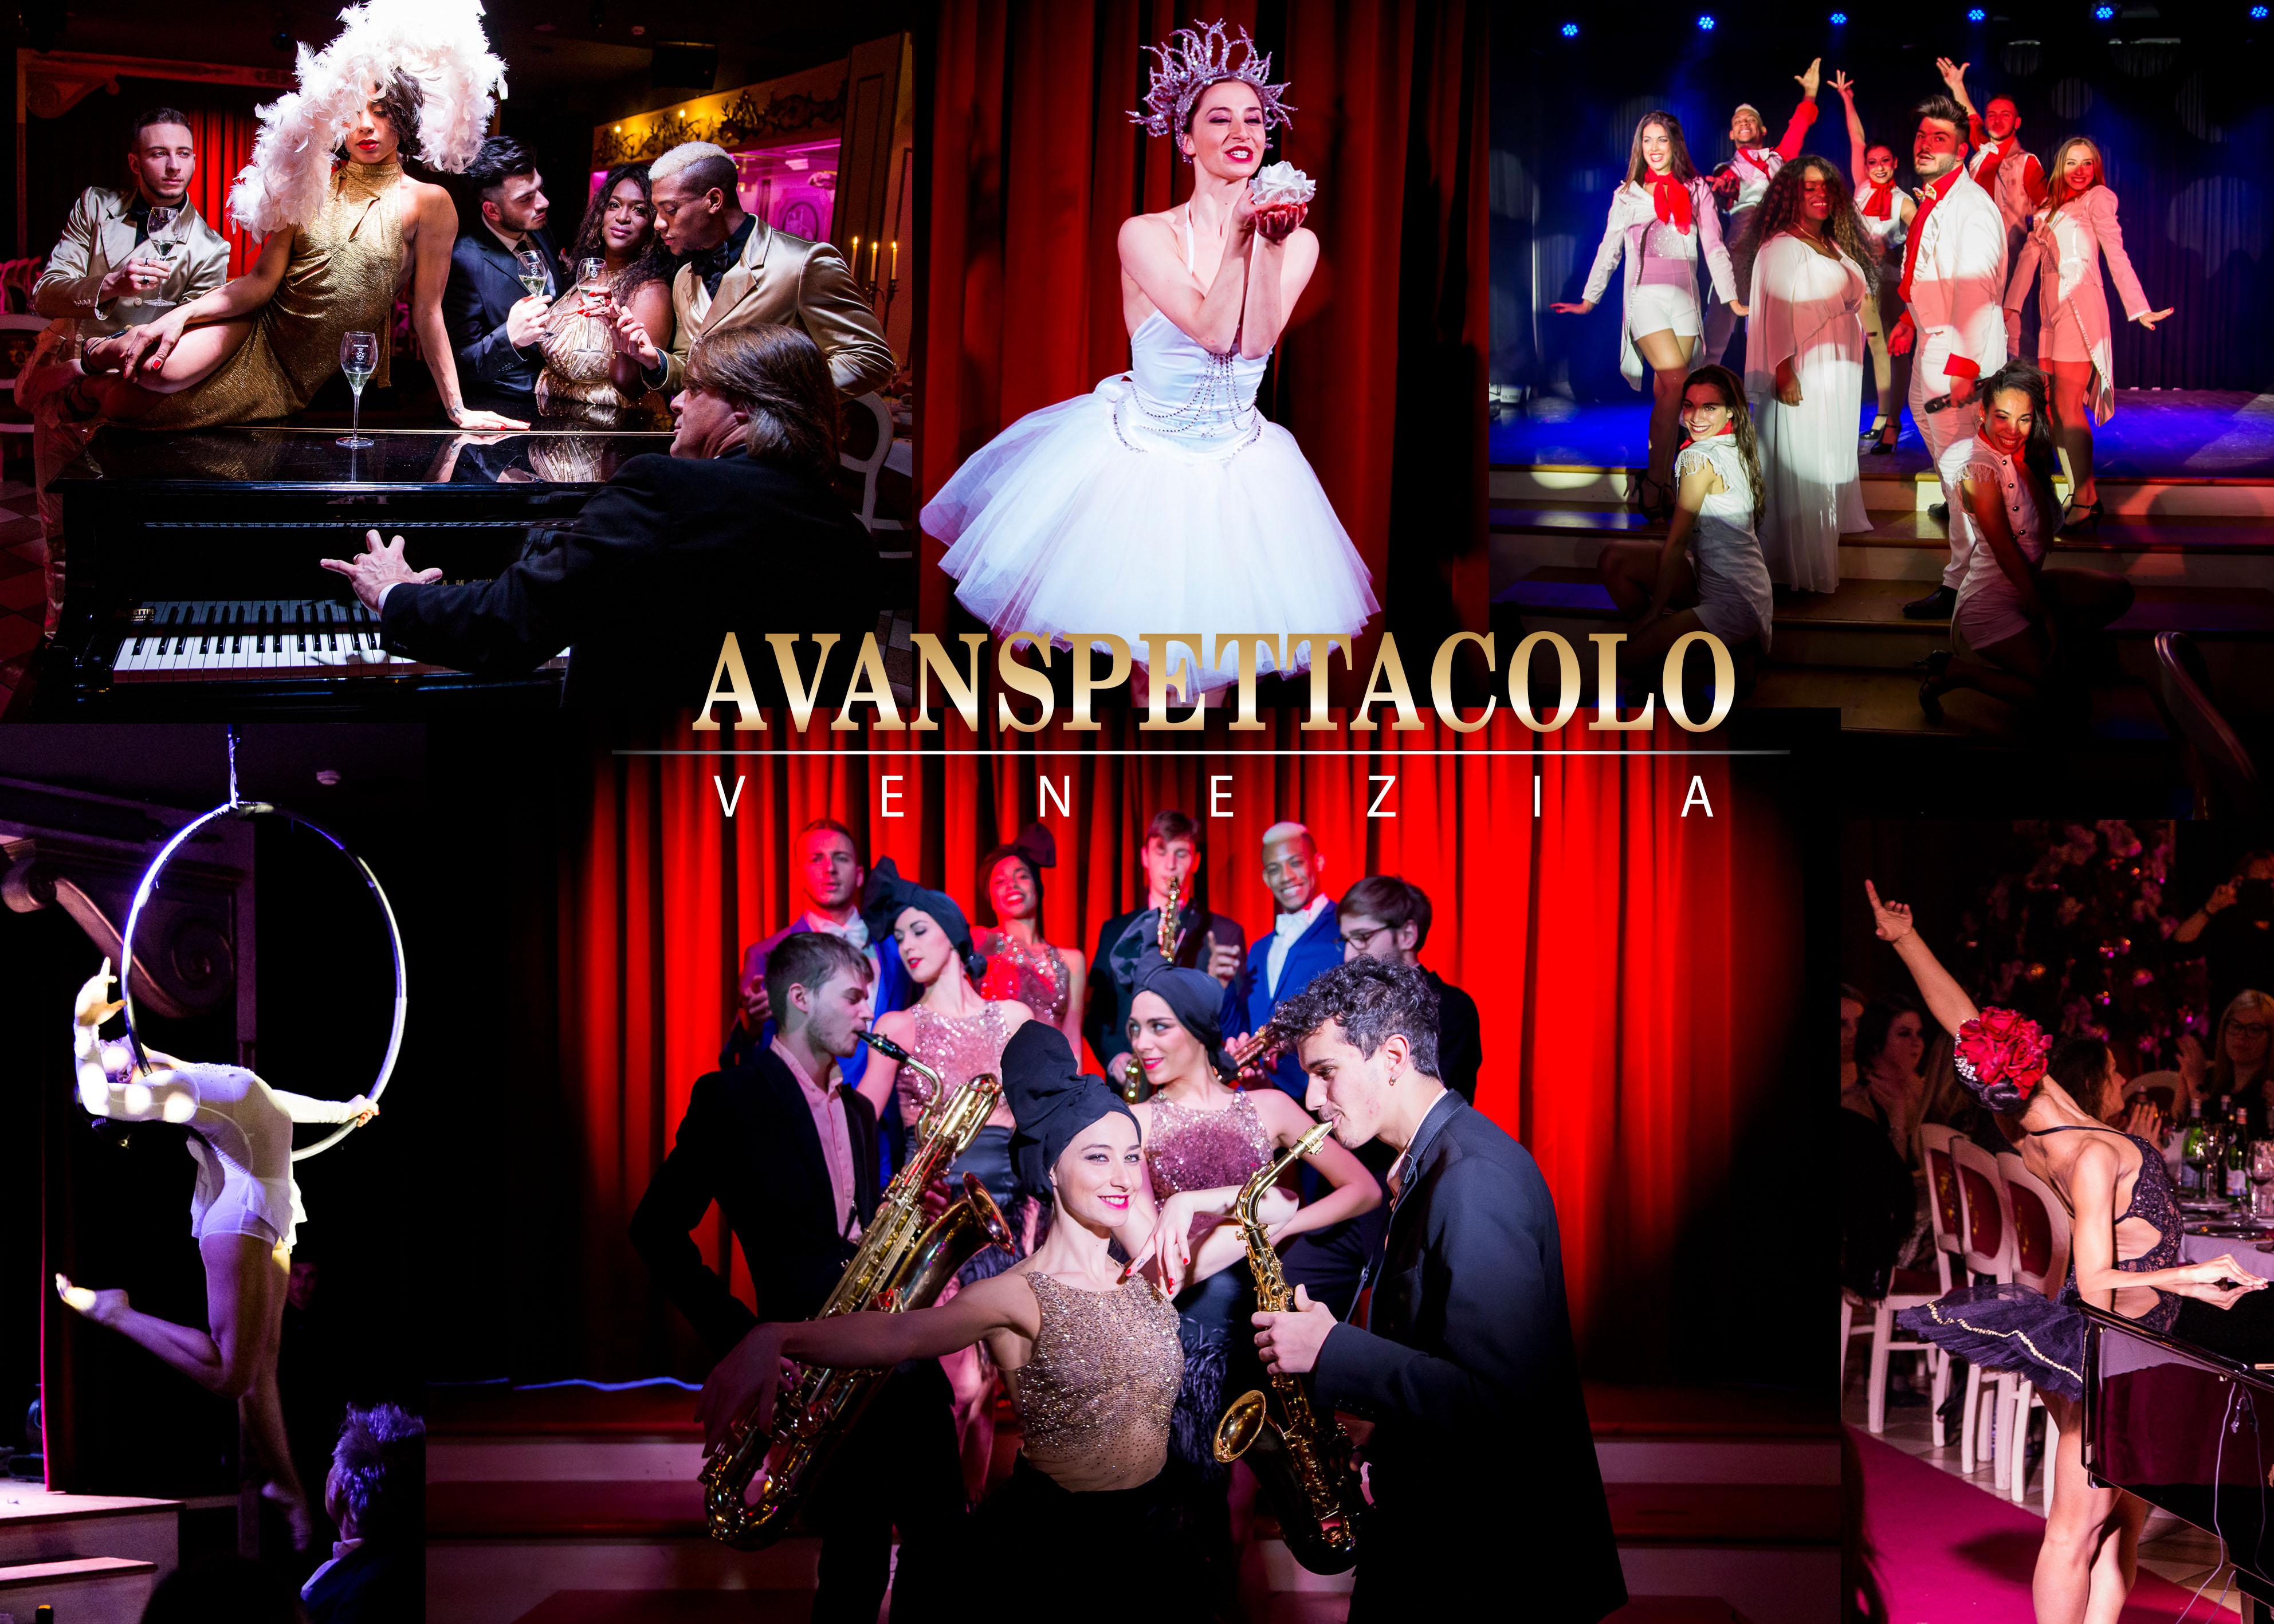 Grand Show Magic_Avanspettacolo Venezia